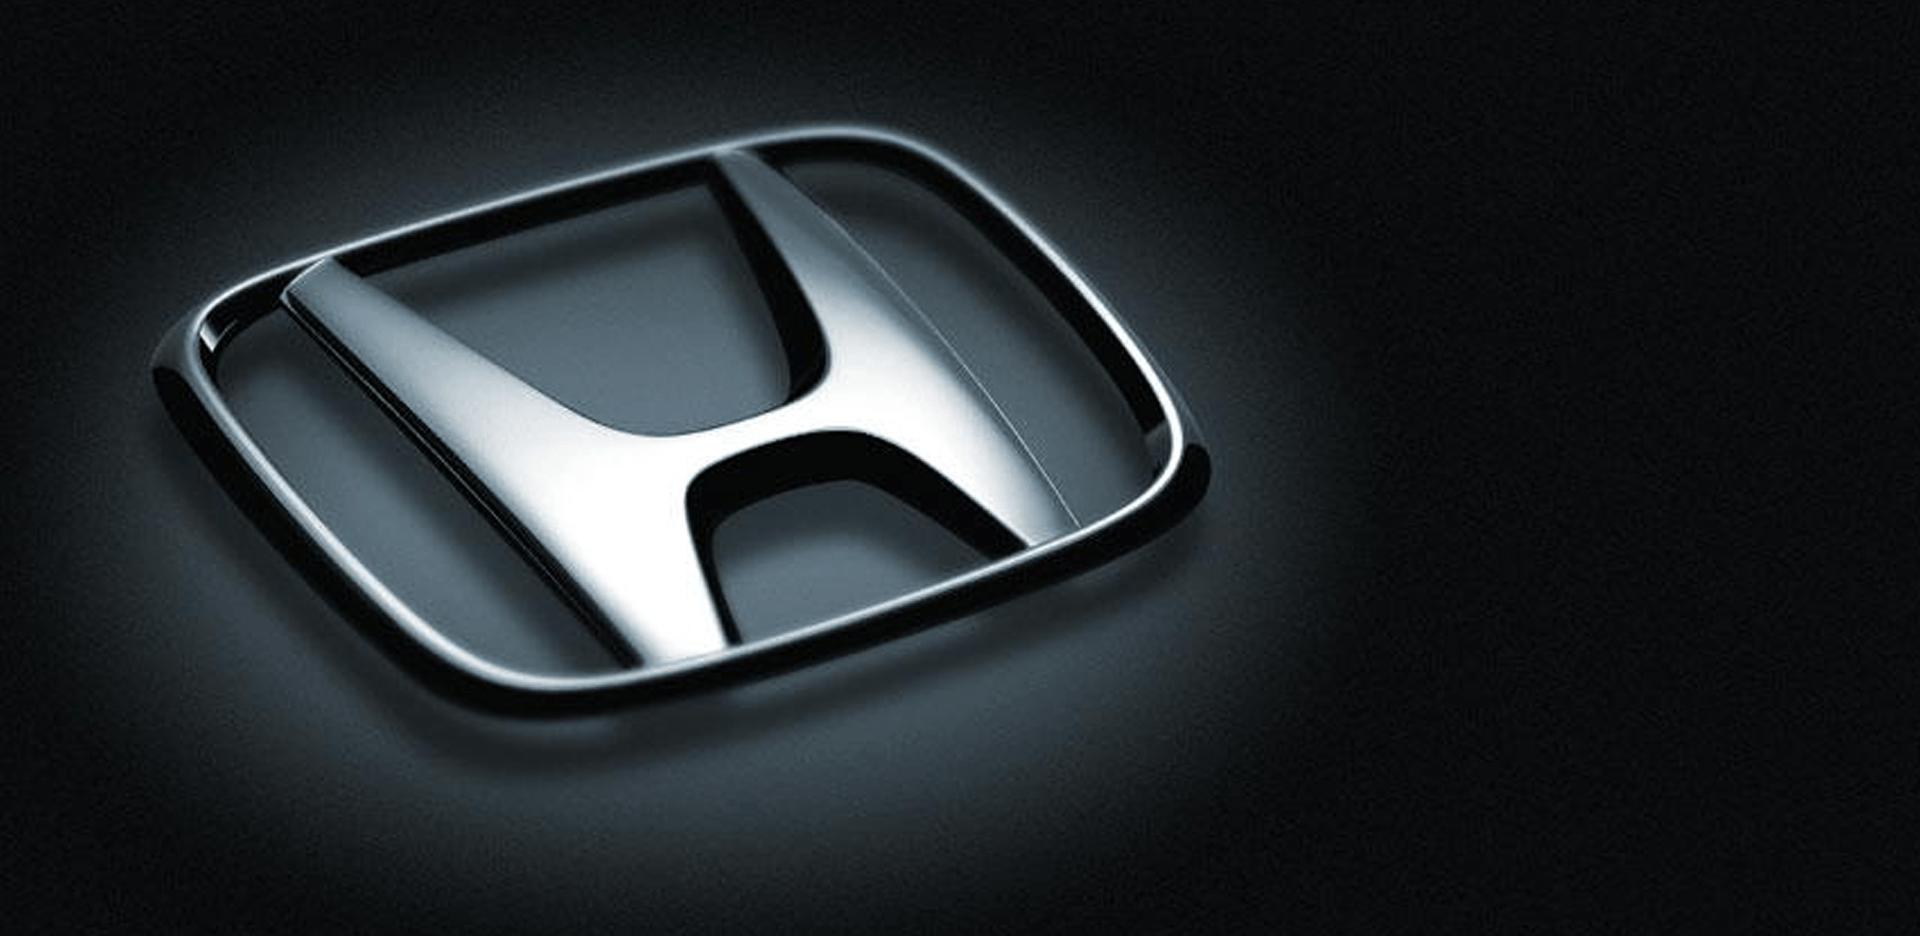 Honda Wallpapers Top Free Honda Backgrounds Wallpaperaccess